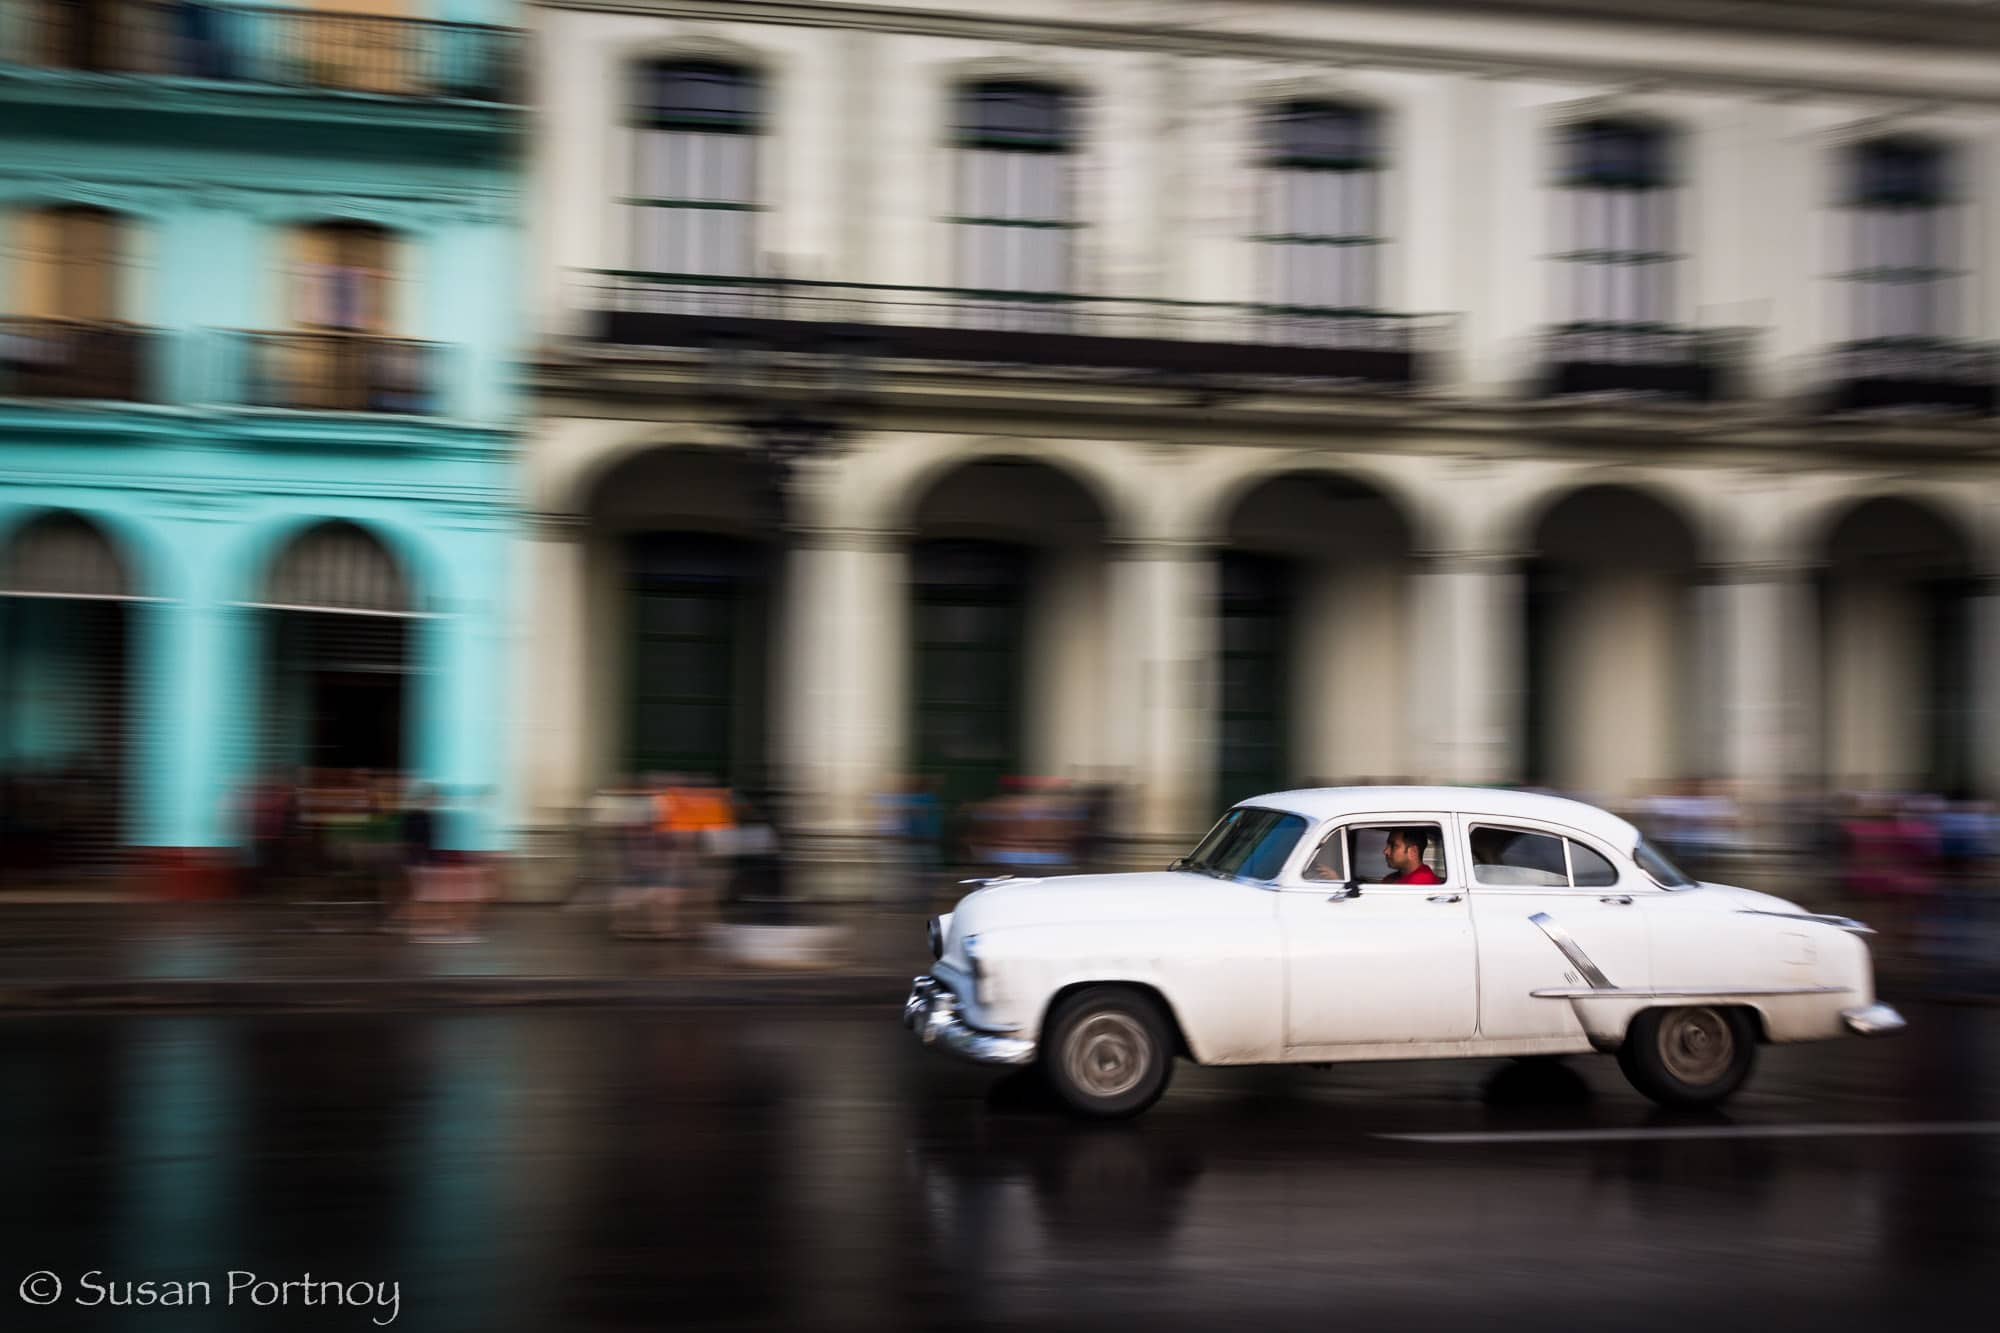 Panning shot of white classic car in Havana, Cuba